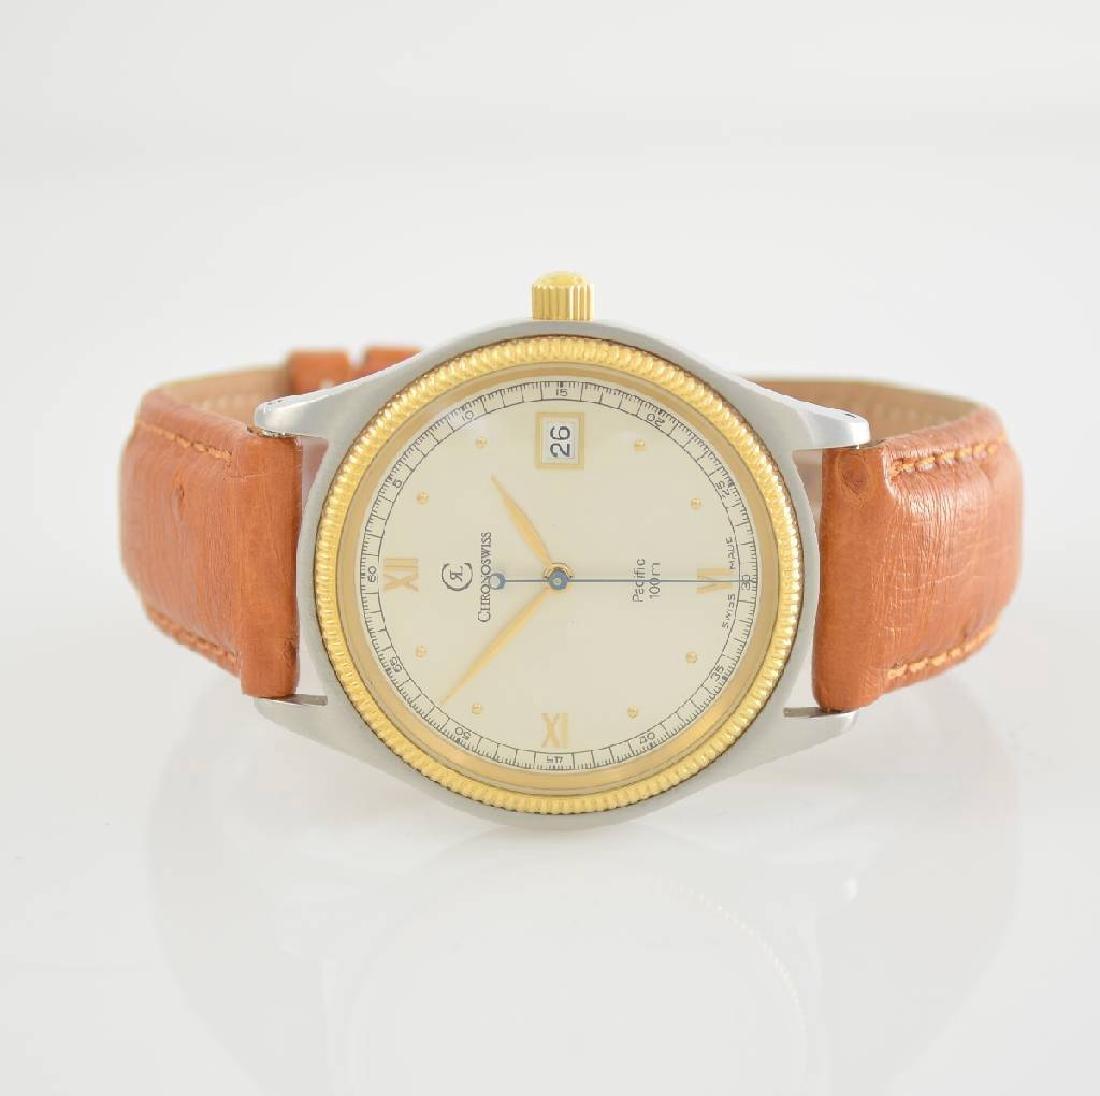 CHRONOSWISS Pacific gents wristwatch